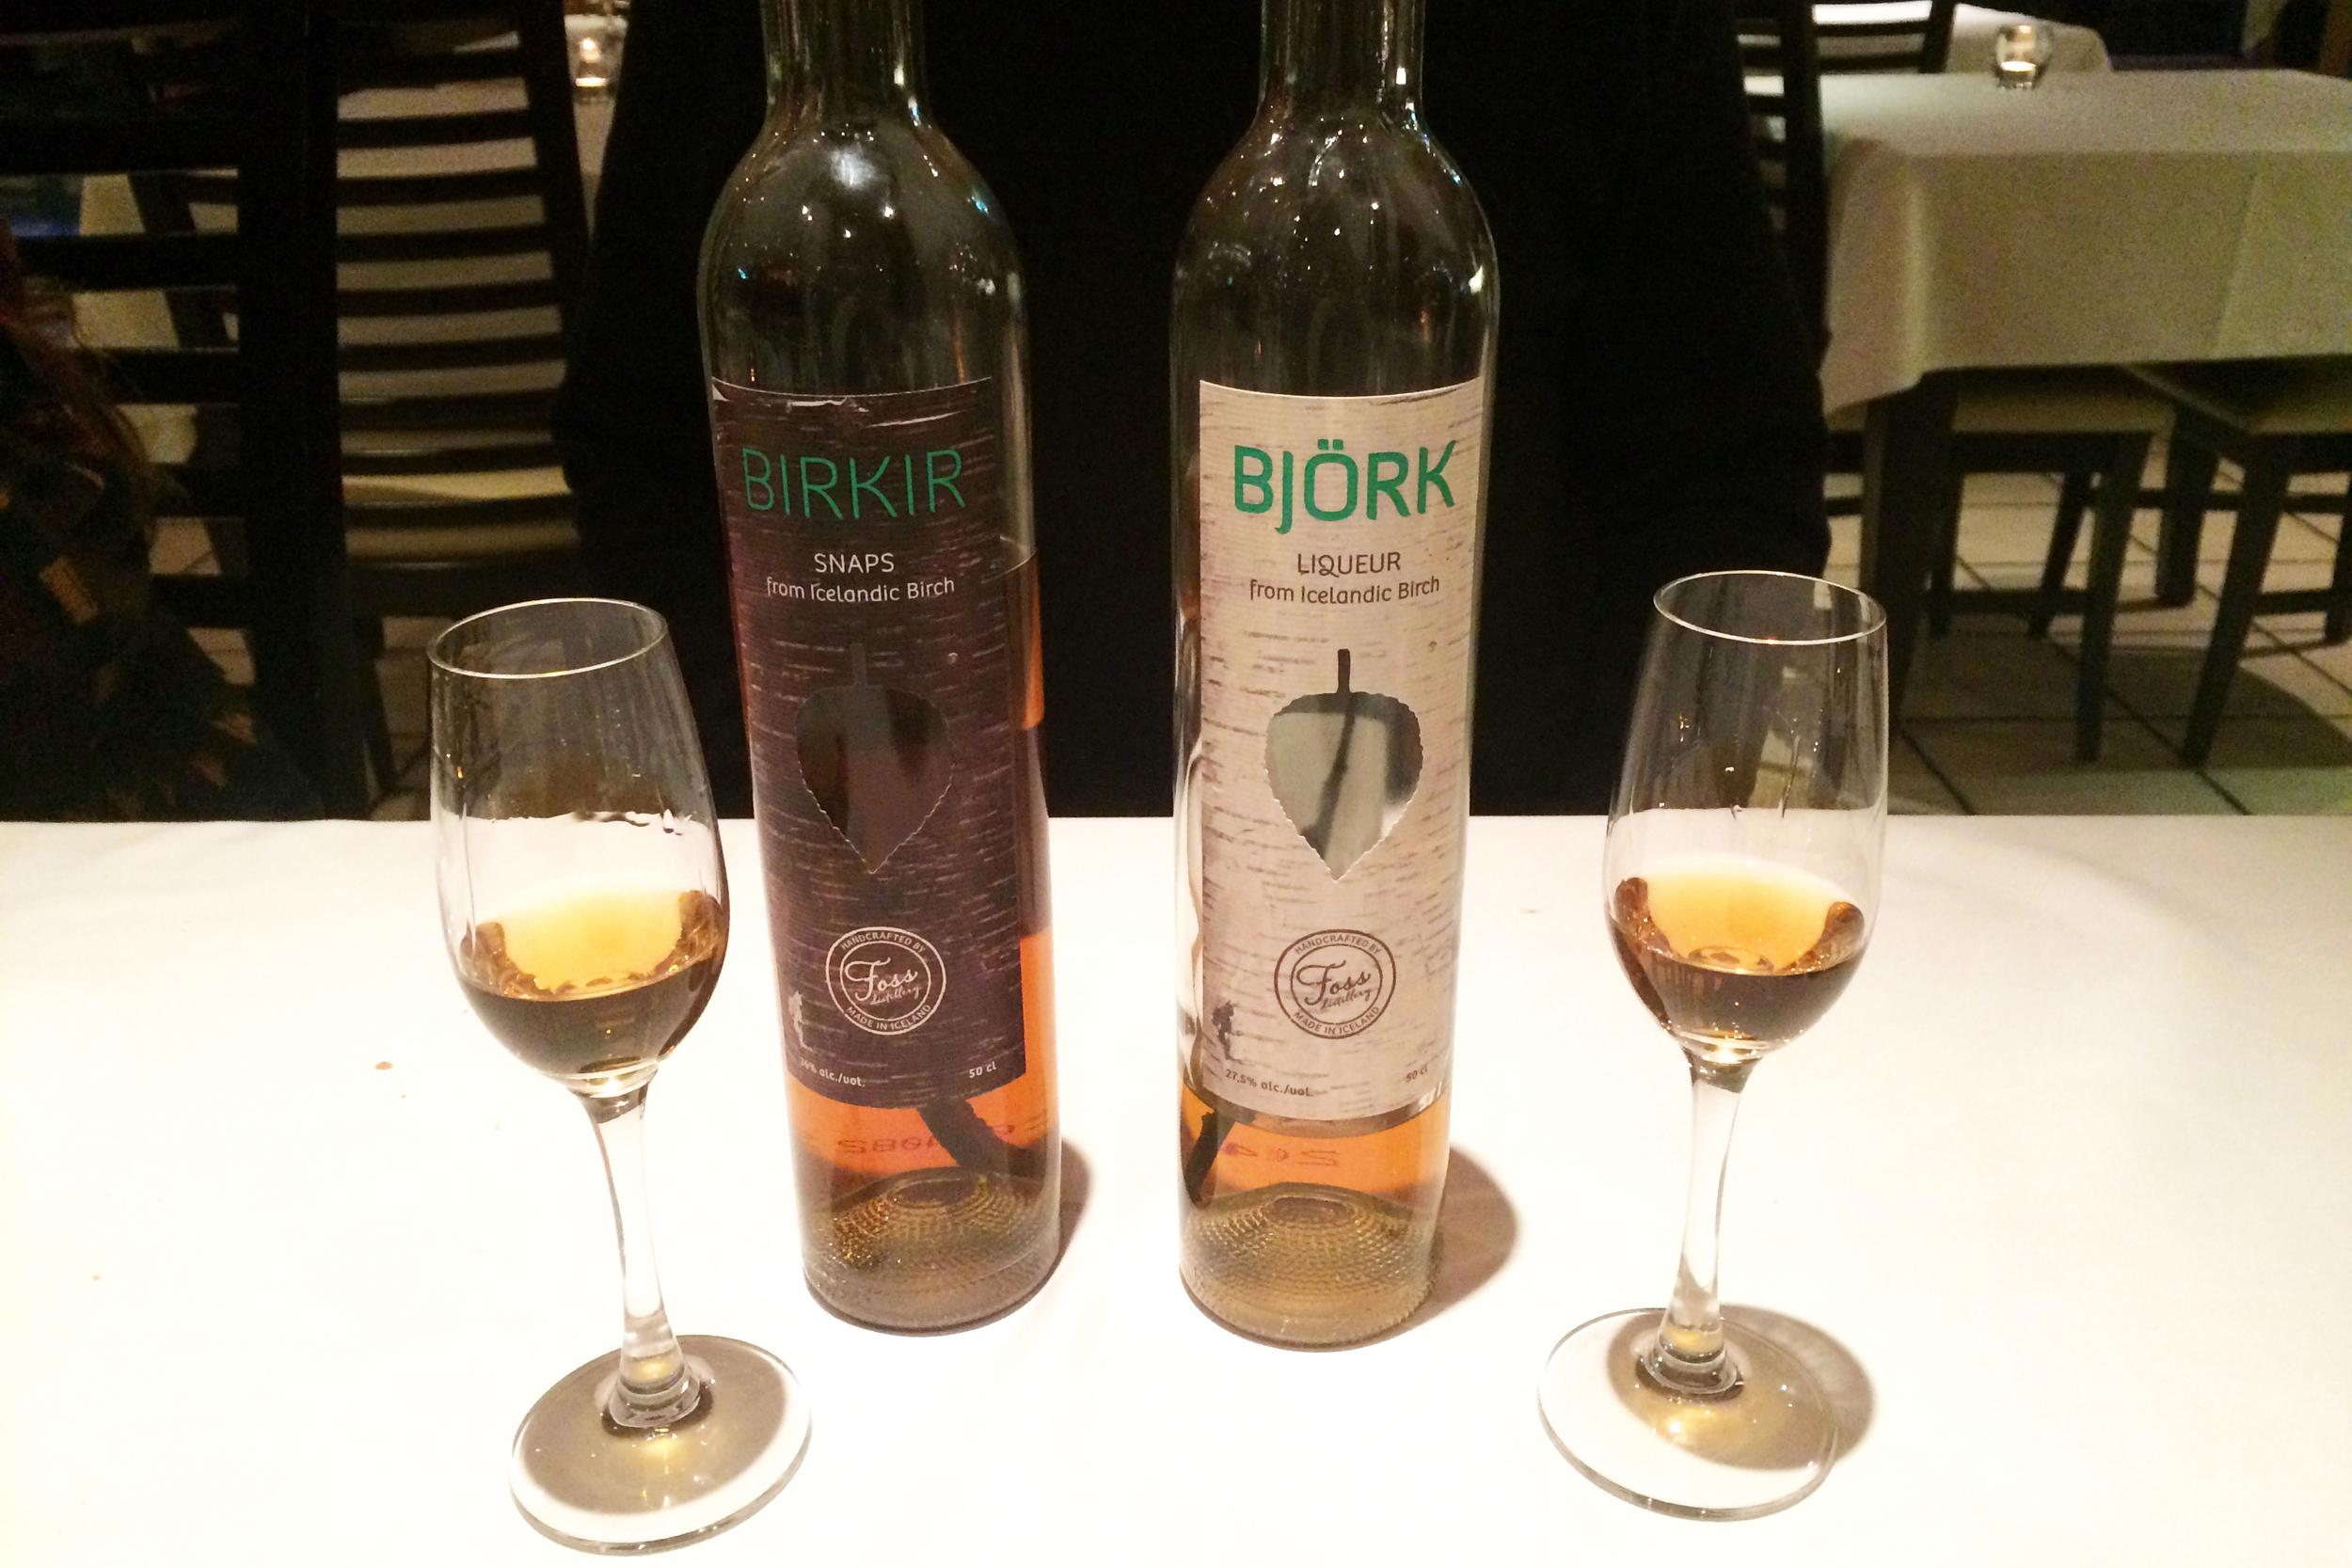 Birkir & Bjork birch-infused liquors